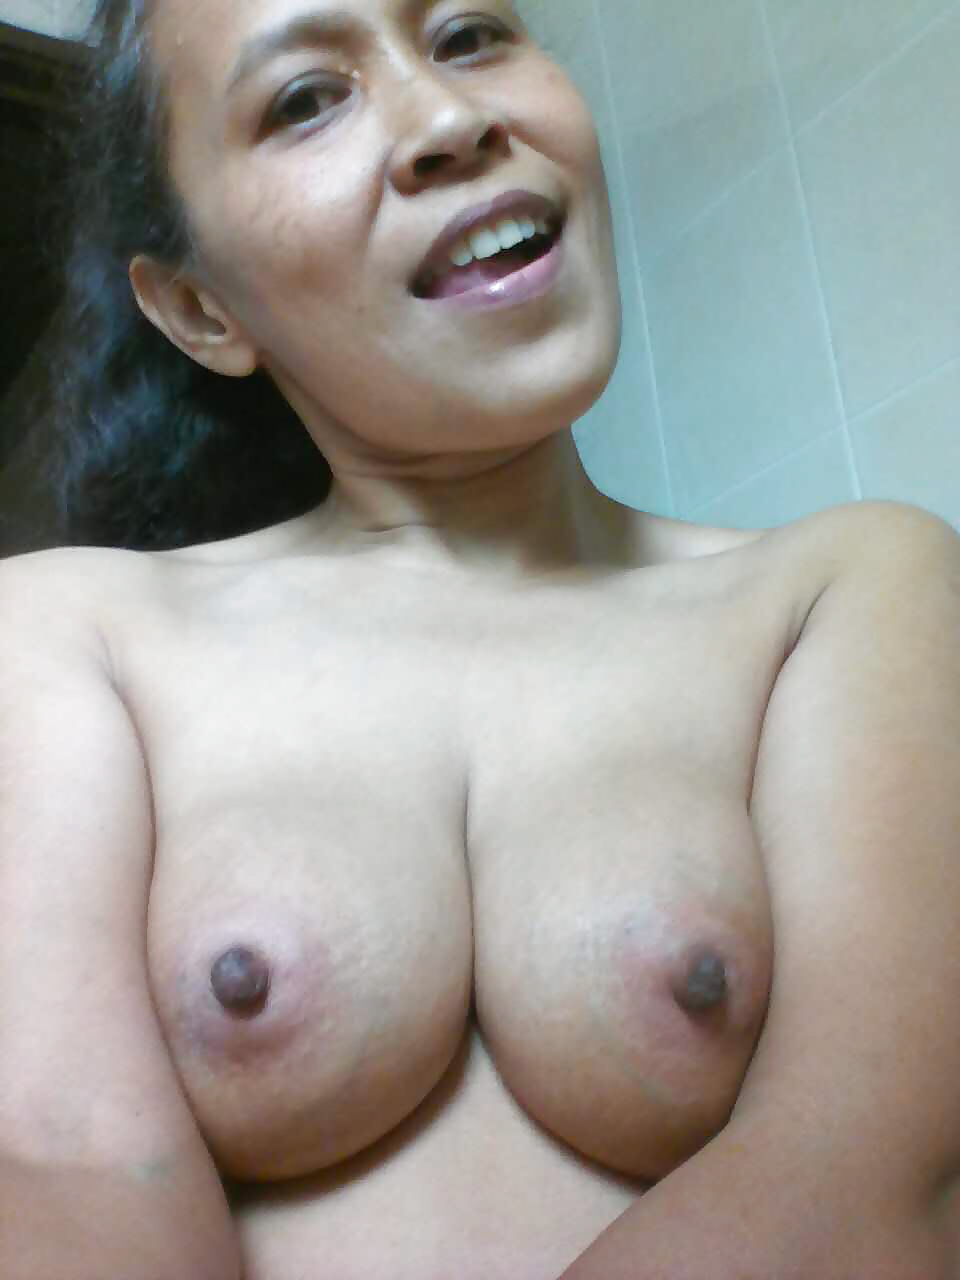 malay-women-milf-mike-in-brazil-porn